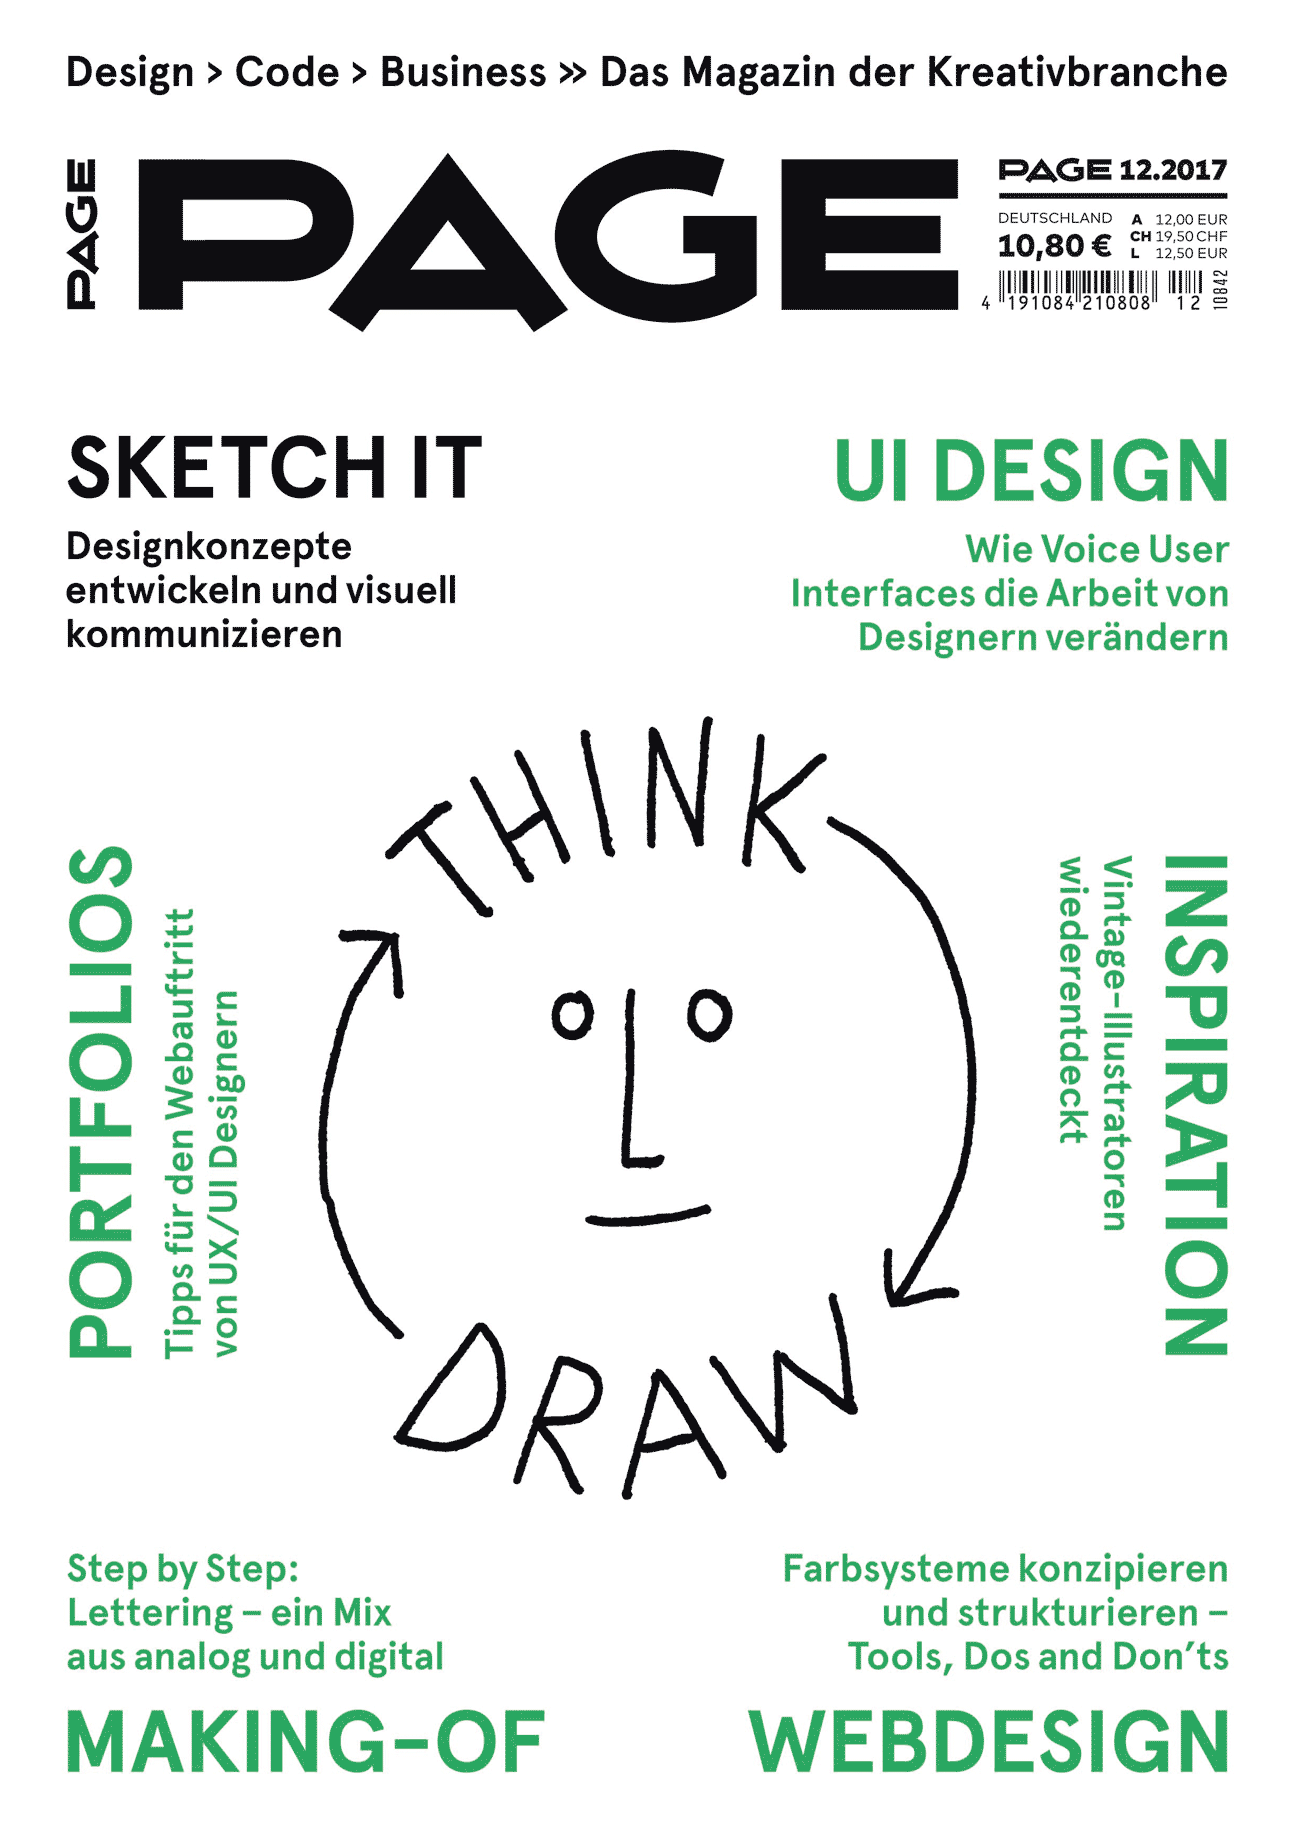 Corporate Design, Scribble, Digital Design, Grafikdesign, UX Design